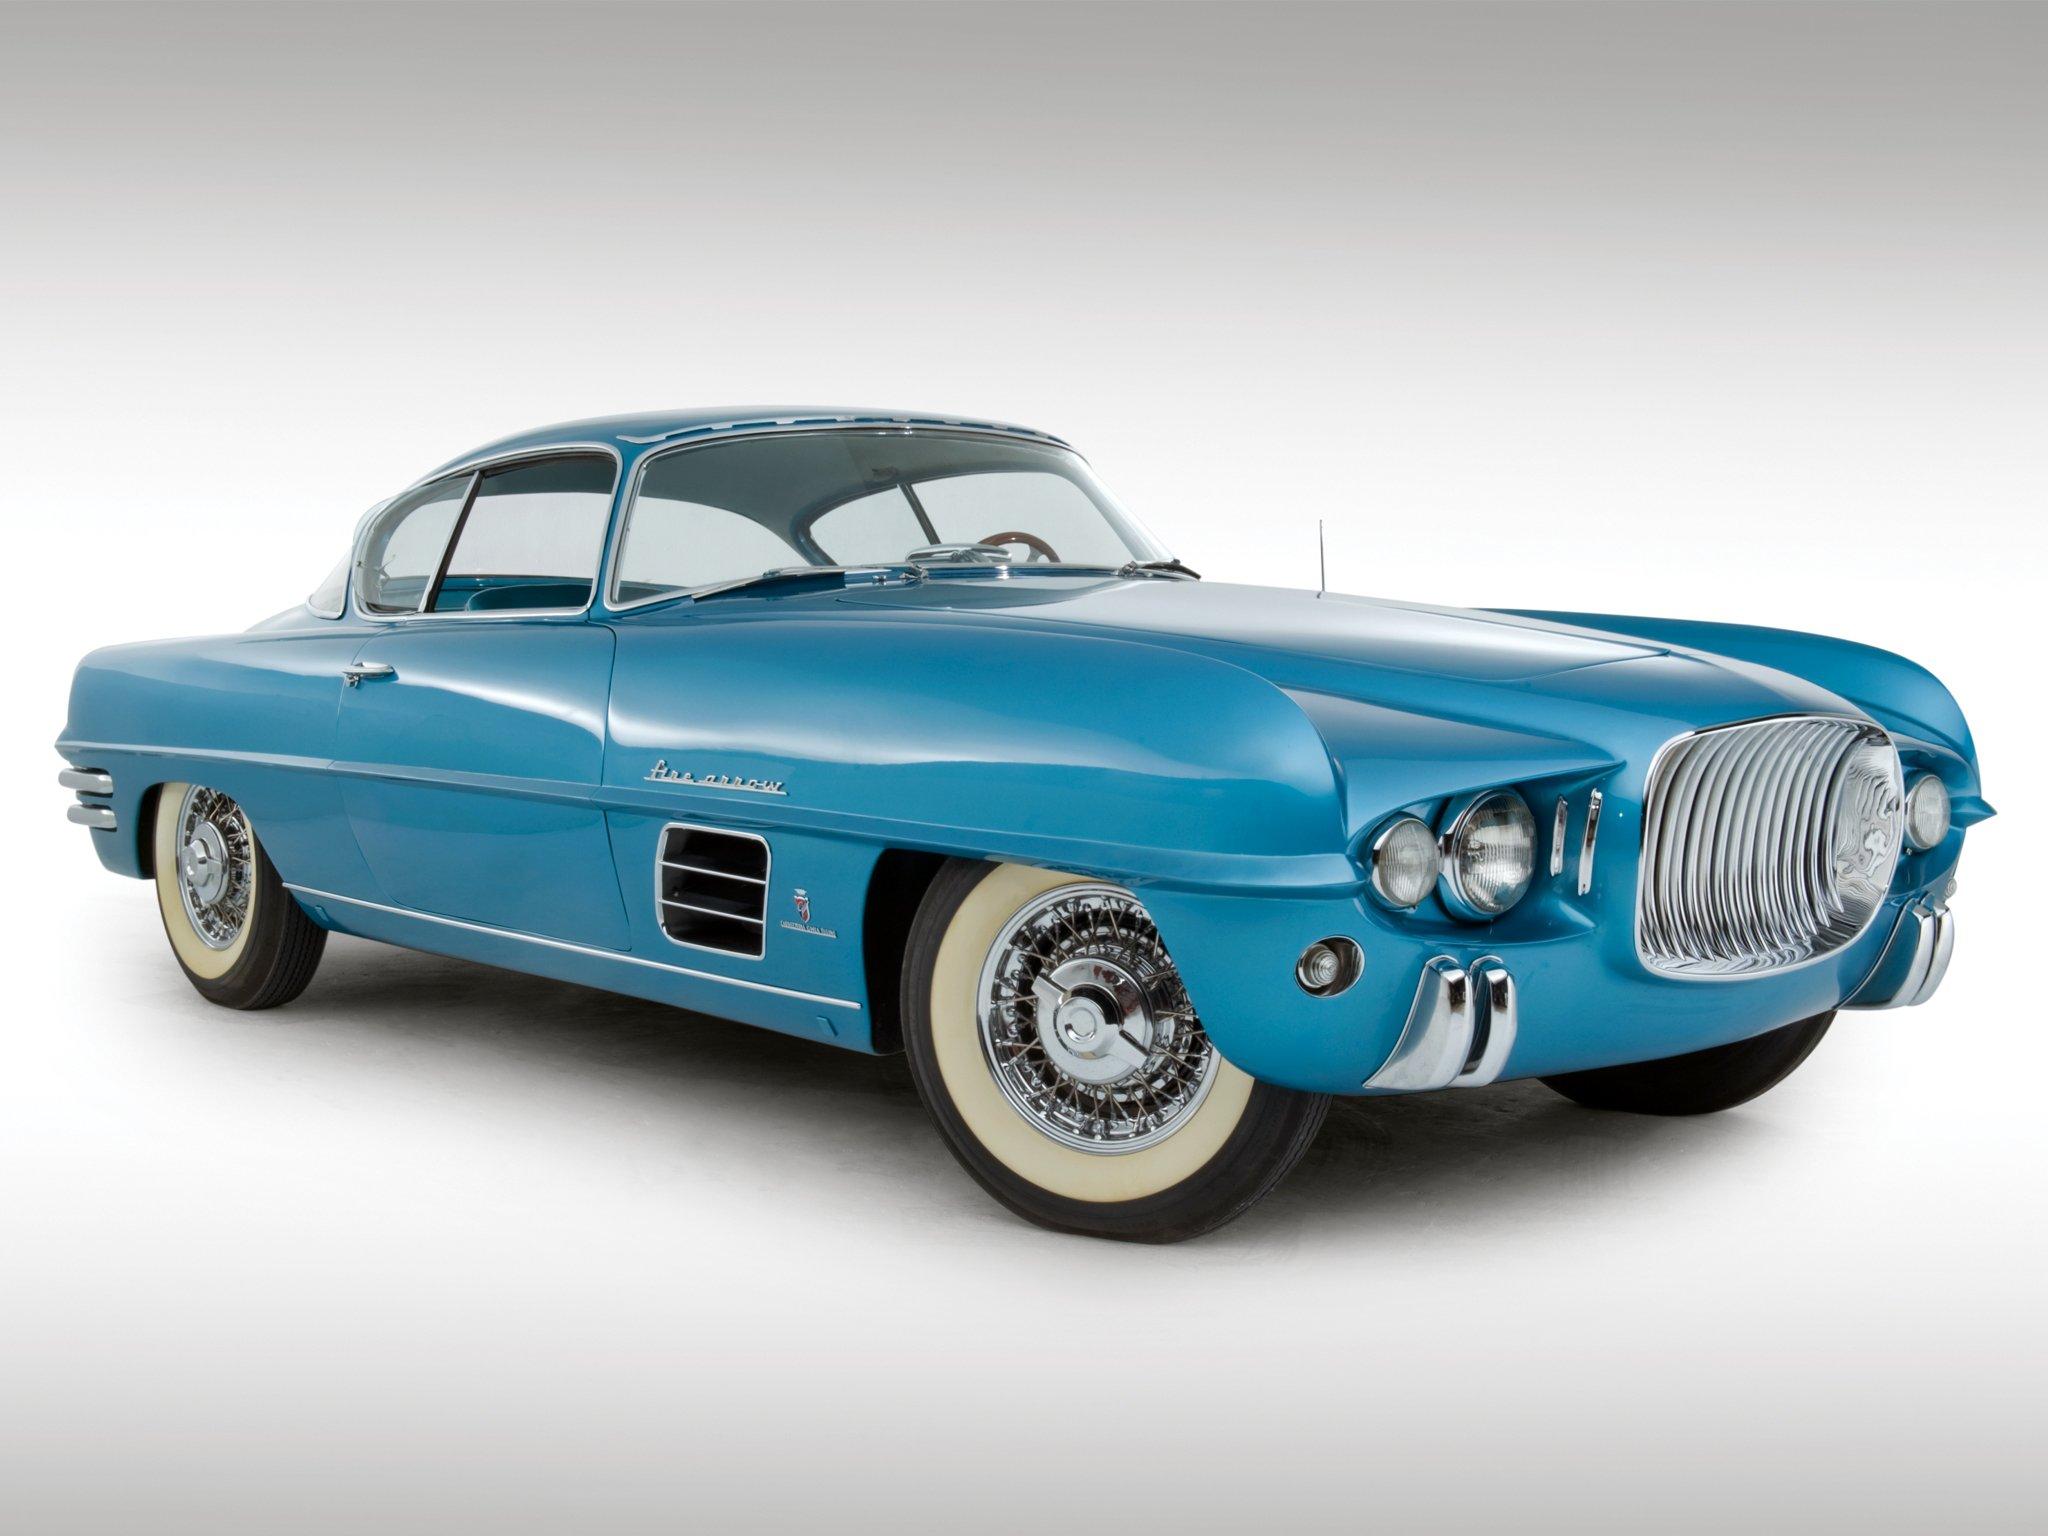 1954 Dodge Firearrow Sport Coupe Concept Car (Ghia). https://t.co/rjESZel9ls